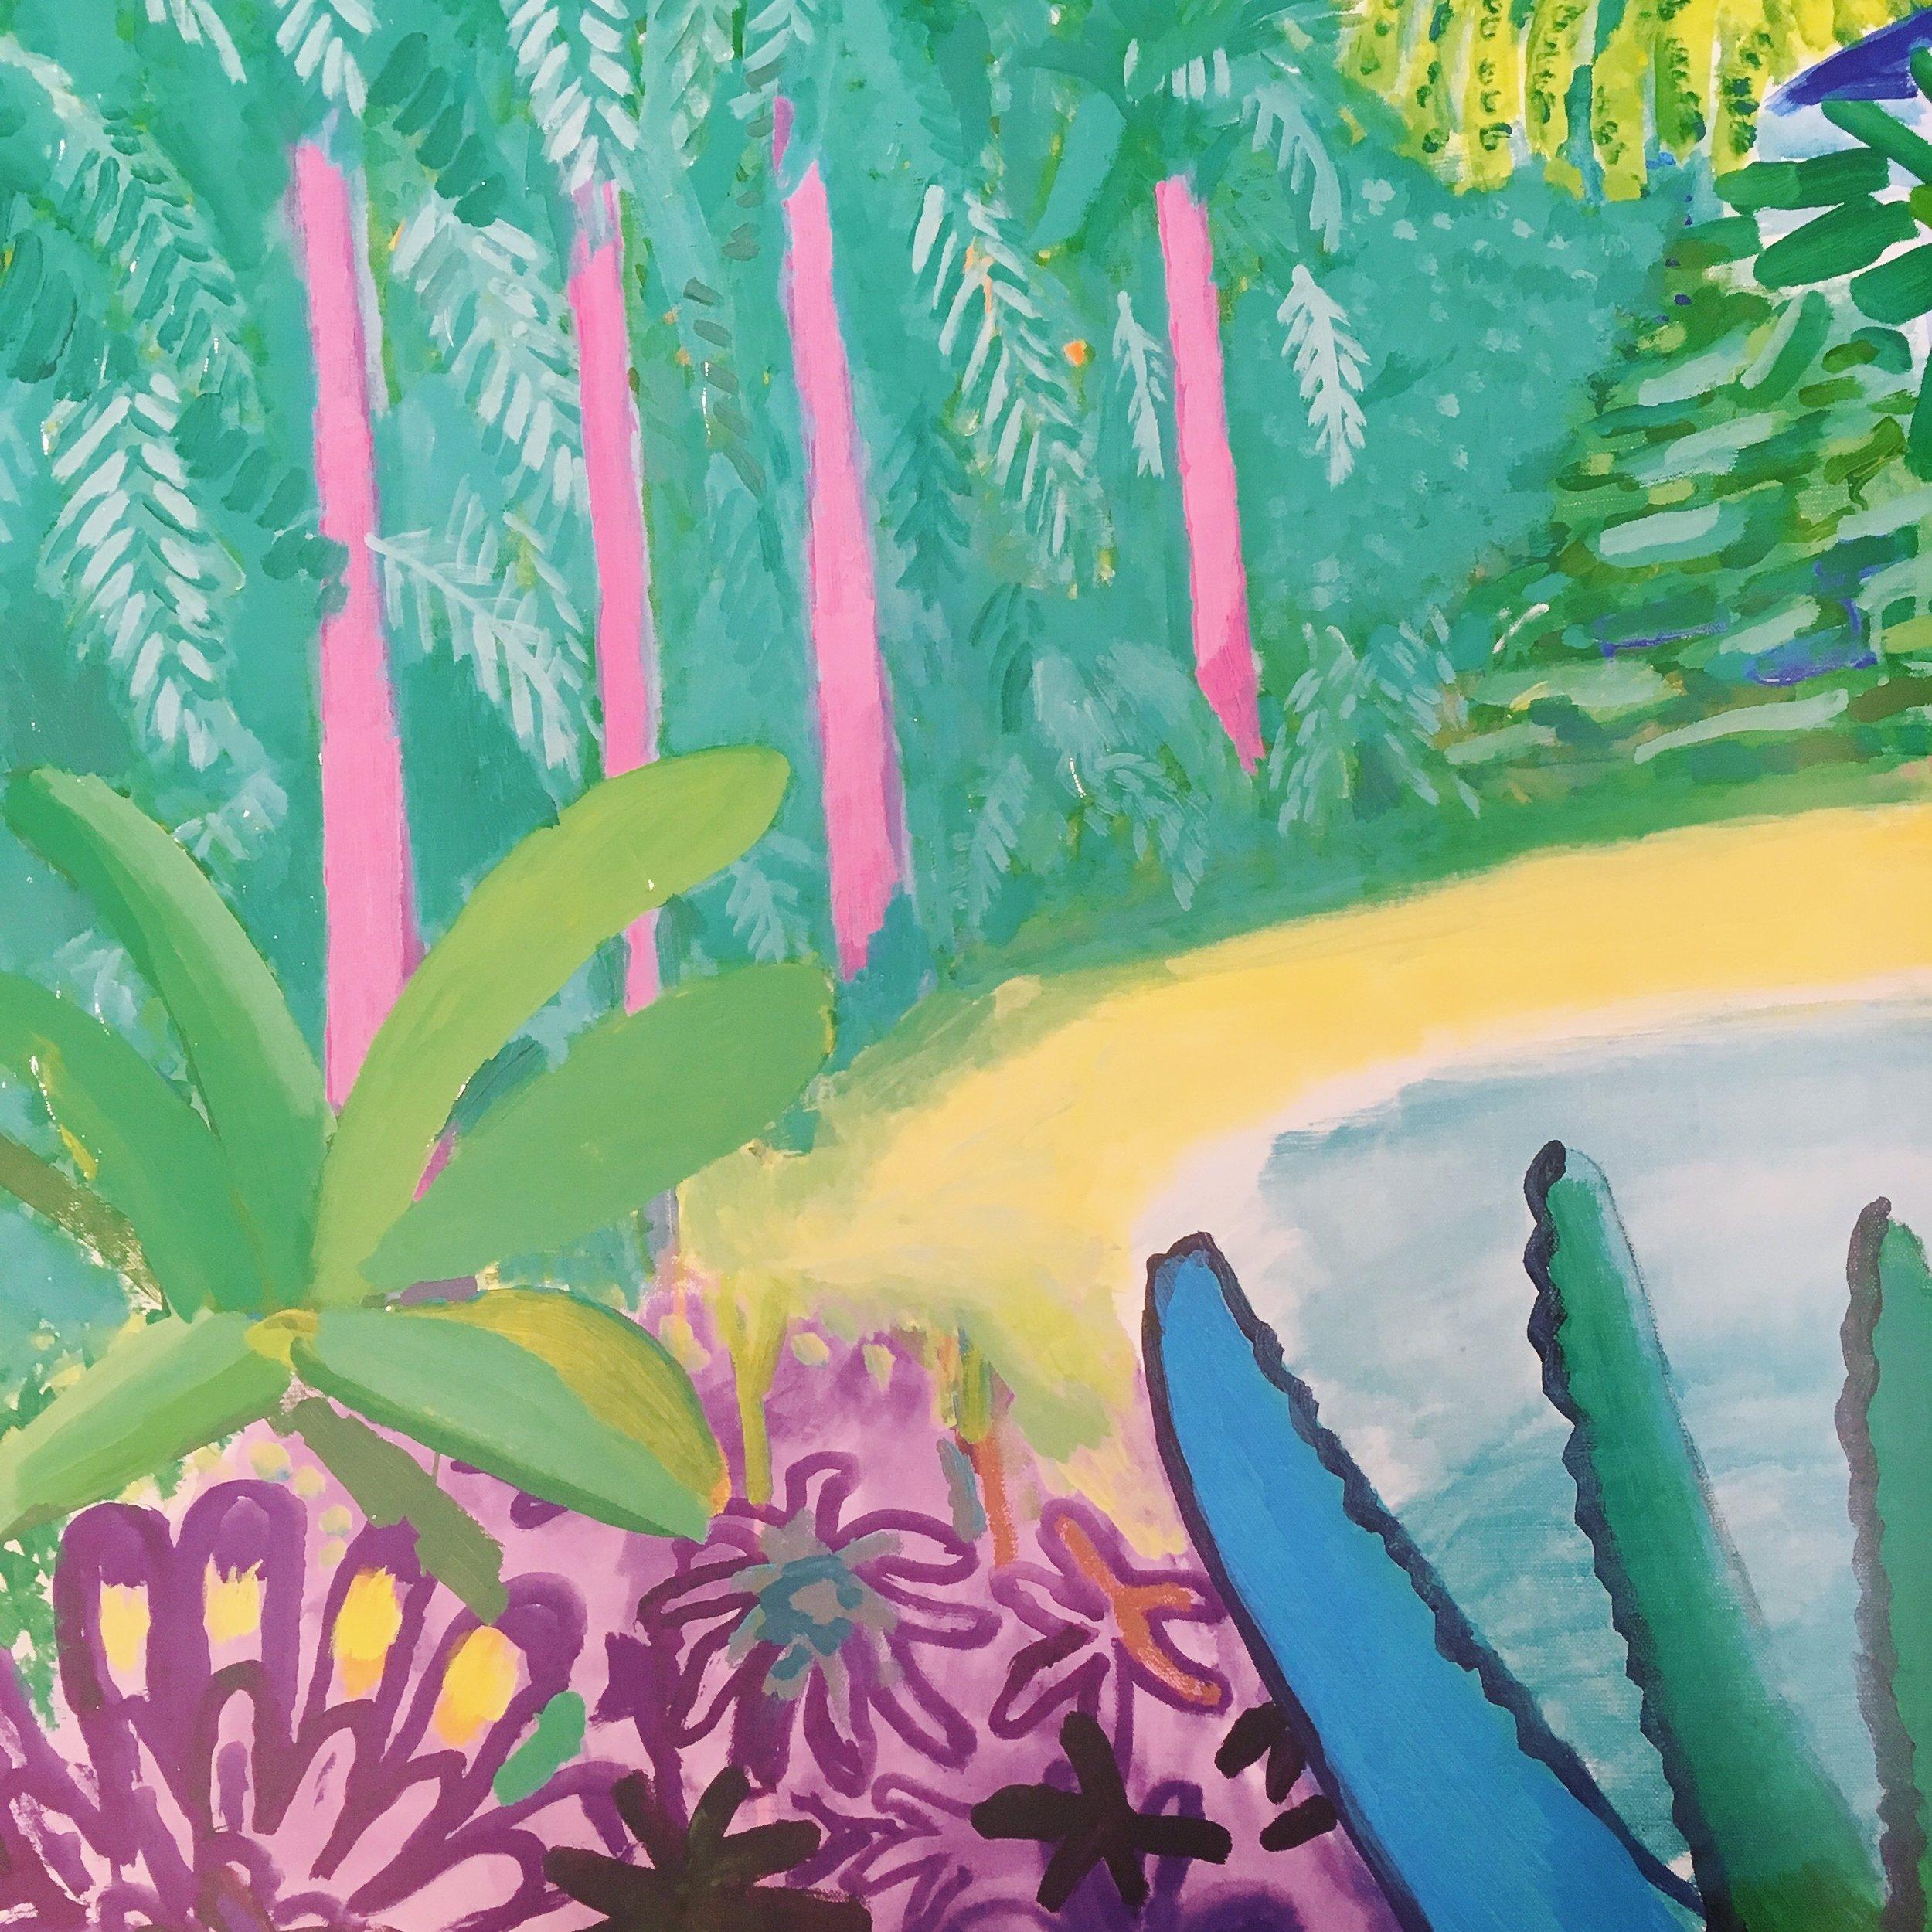 Garden 2015 (detail). Acrylic paint on canvas.